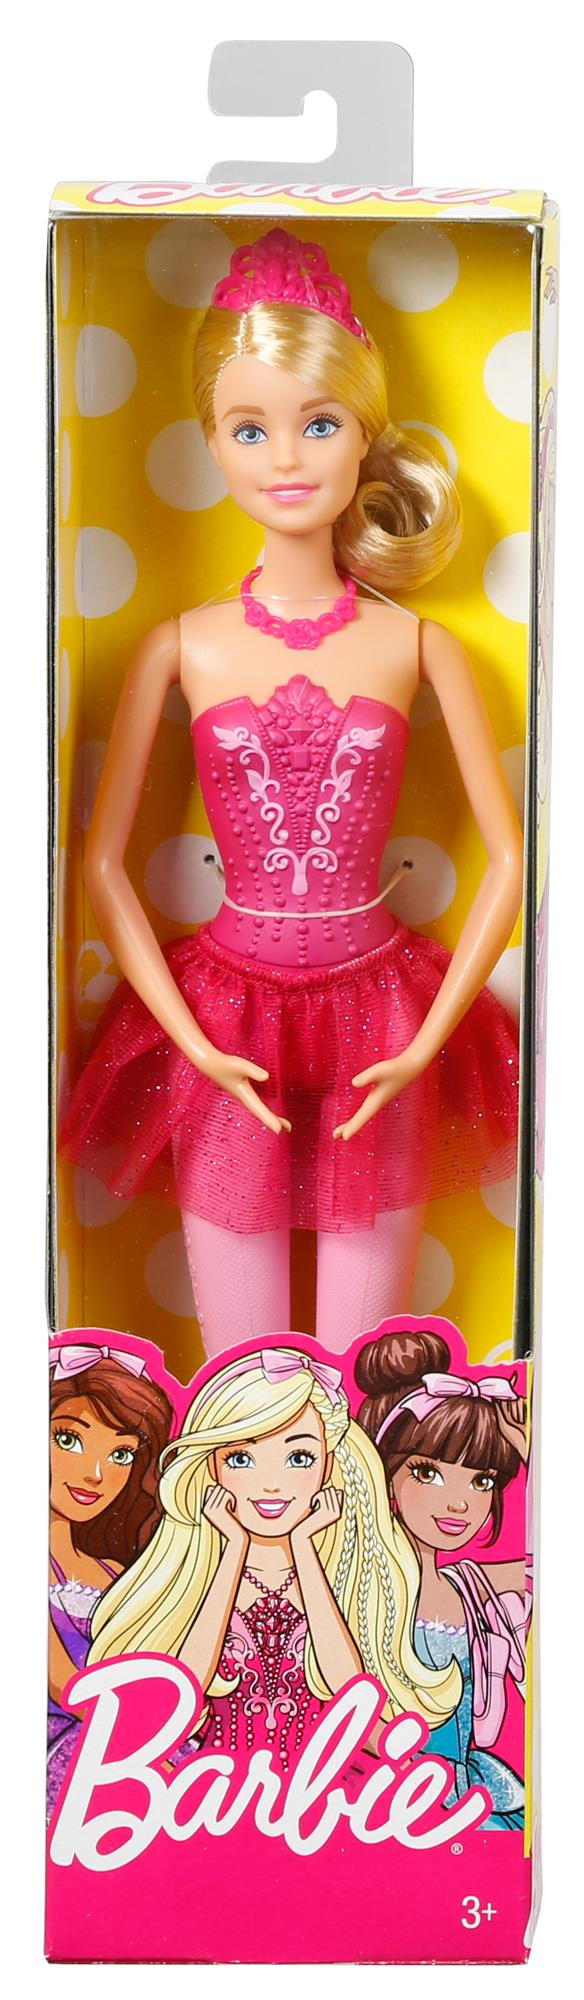 Barbie Fairytale - Bambola Ballerina, Abito Rosa, Bionda 12-36 Mesi, 12+ Anni, 8-12 Anni Femmina Barbie ALTRI